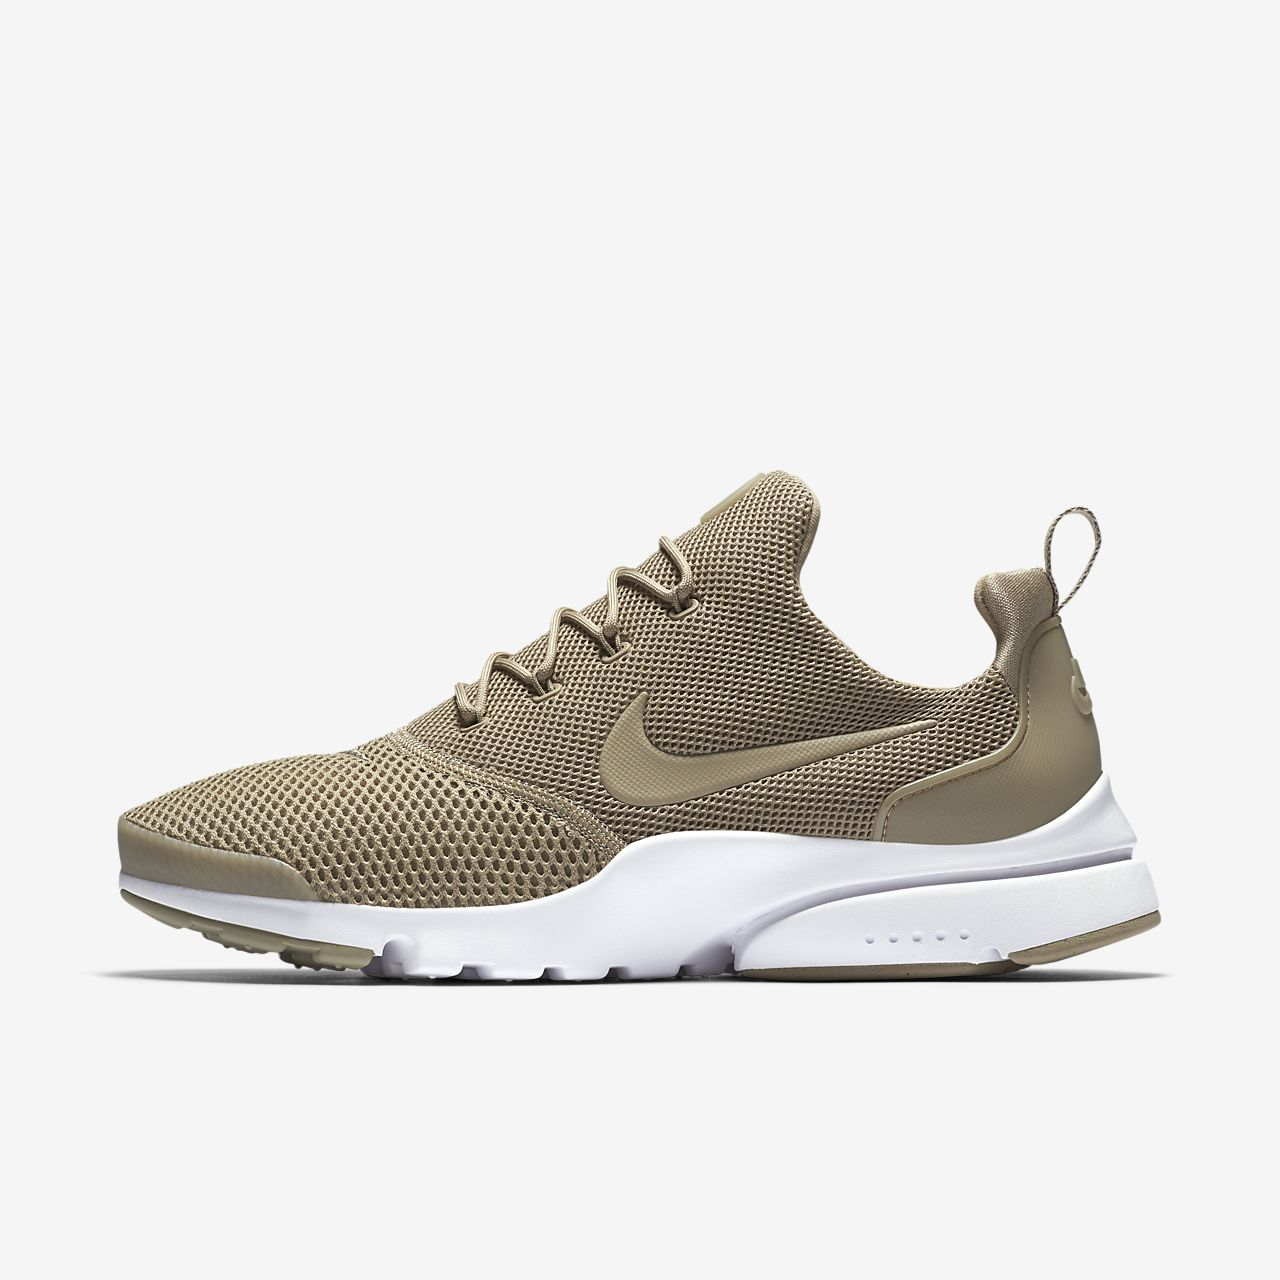 Chaussures De Sport Air Max Commande Laag Marine Nike 5p7KjYhe